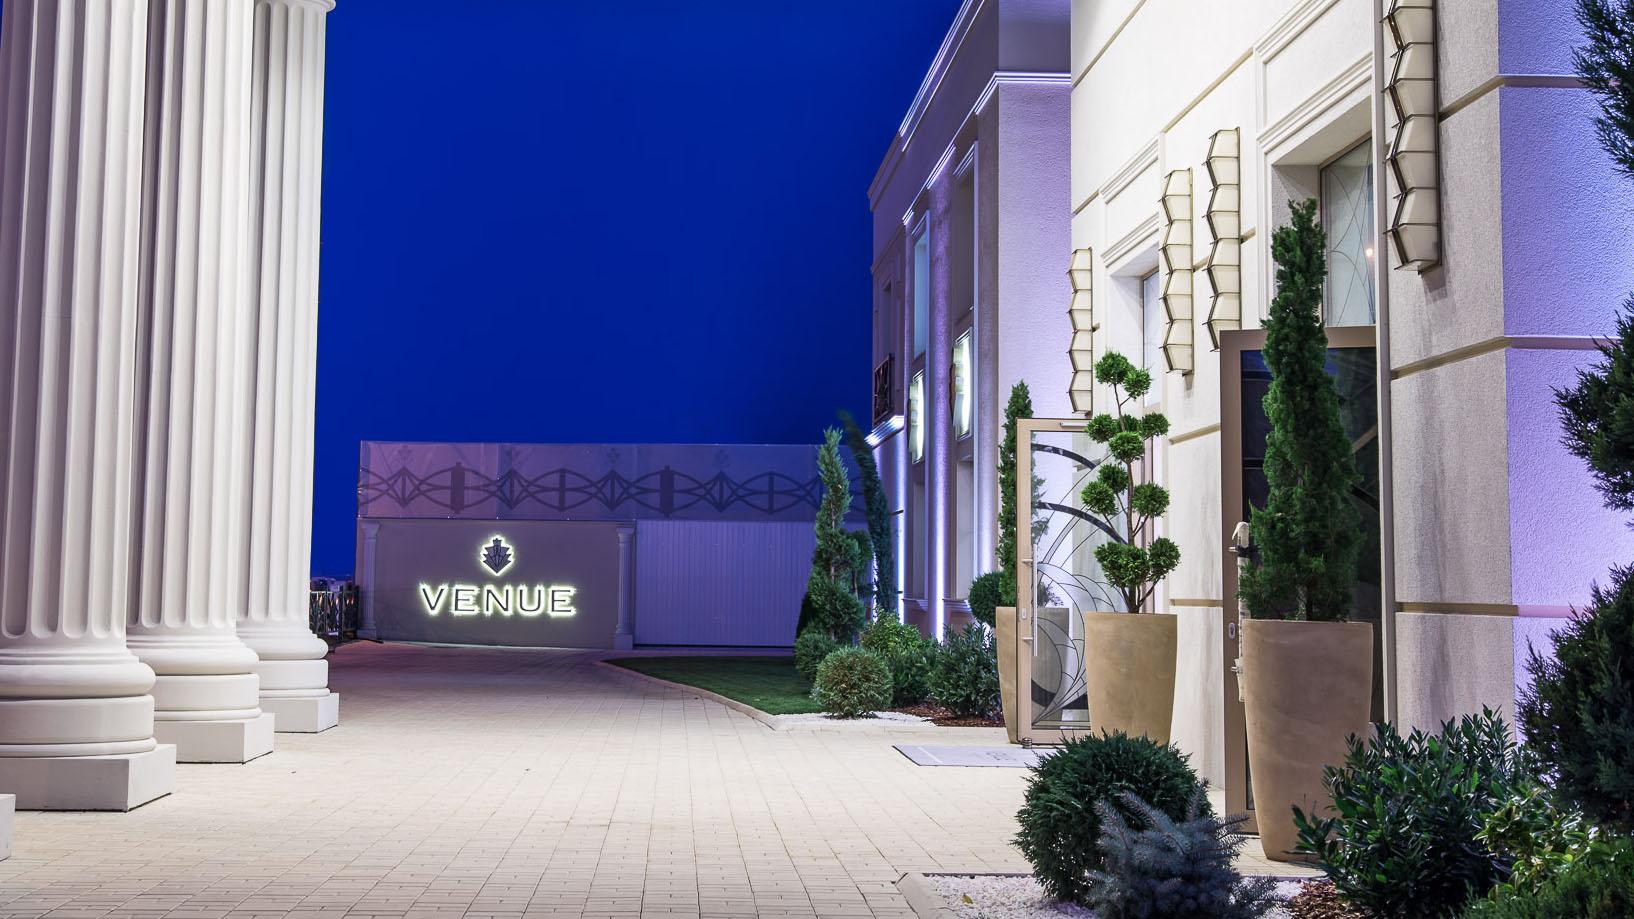 Venue, Events Hall. Timisoara, Romania.